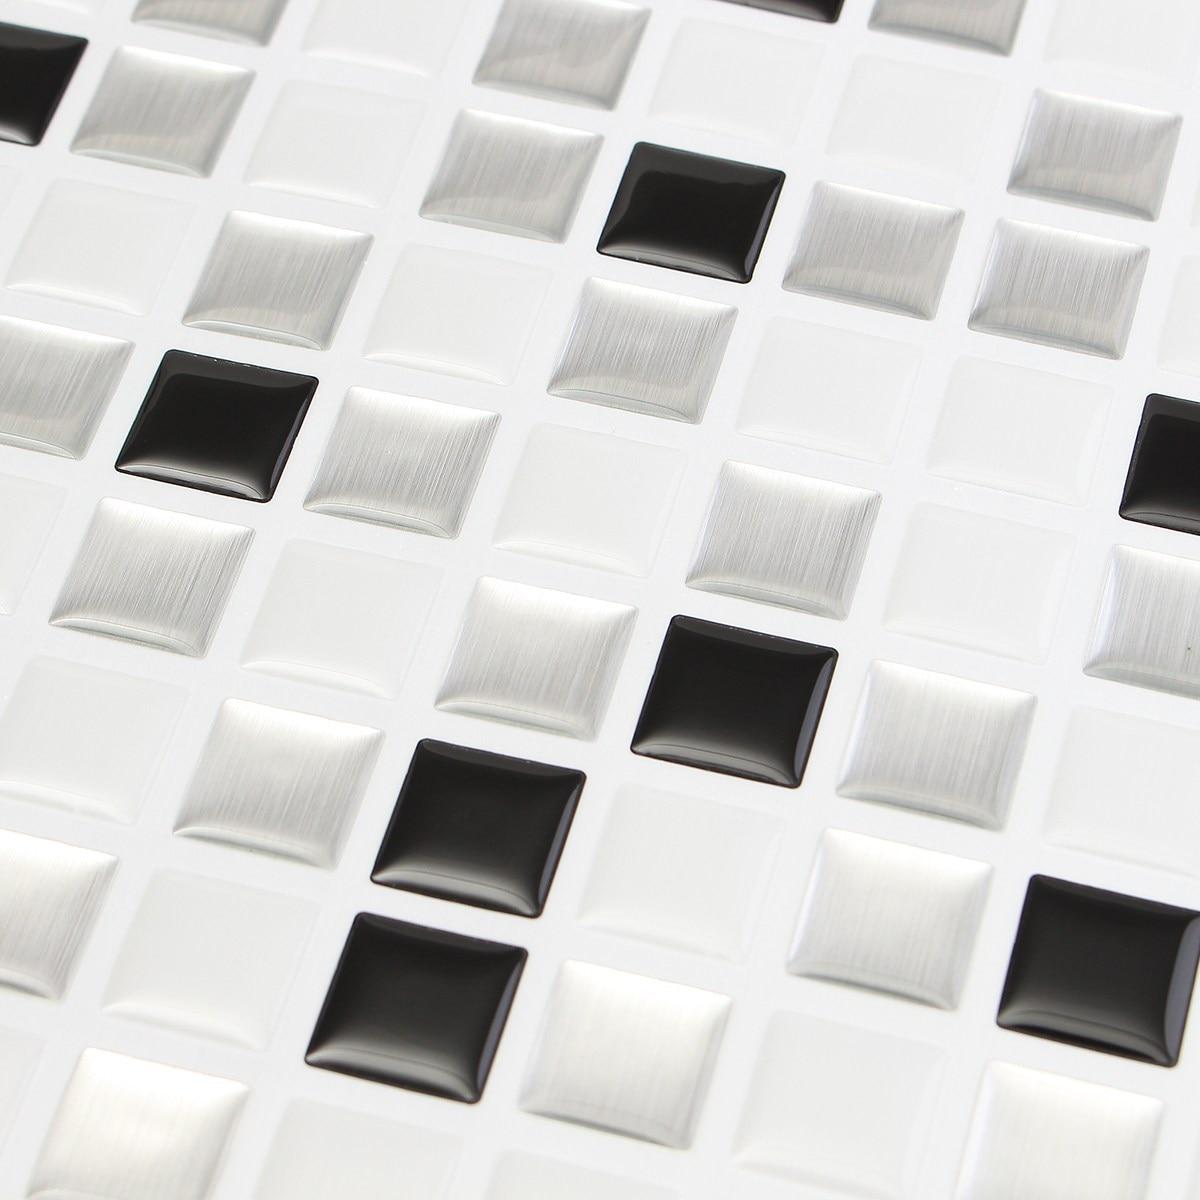 25 X 25cm Waterproof 3D Wallpaper Home Decor Brick Kitchen Bathroom ...